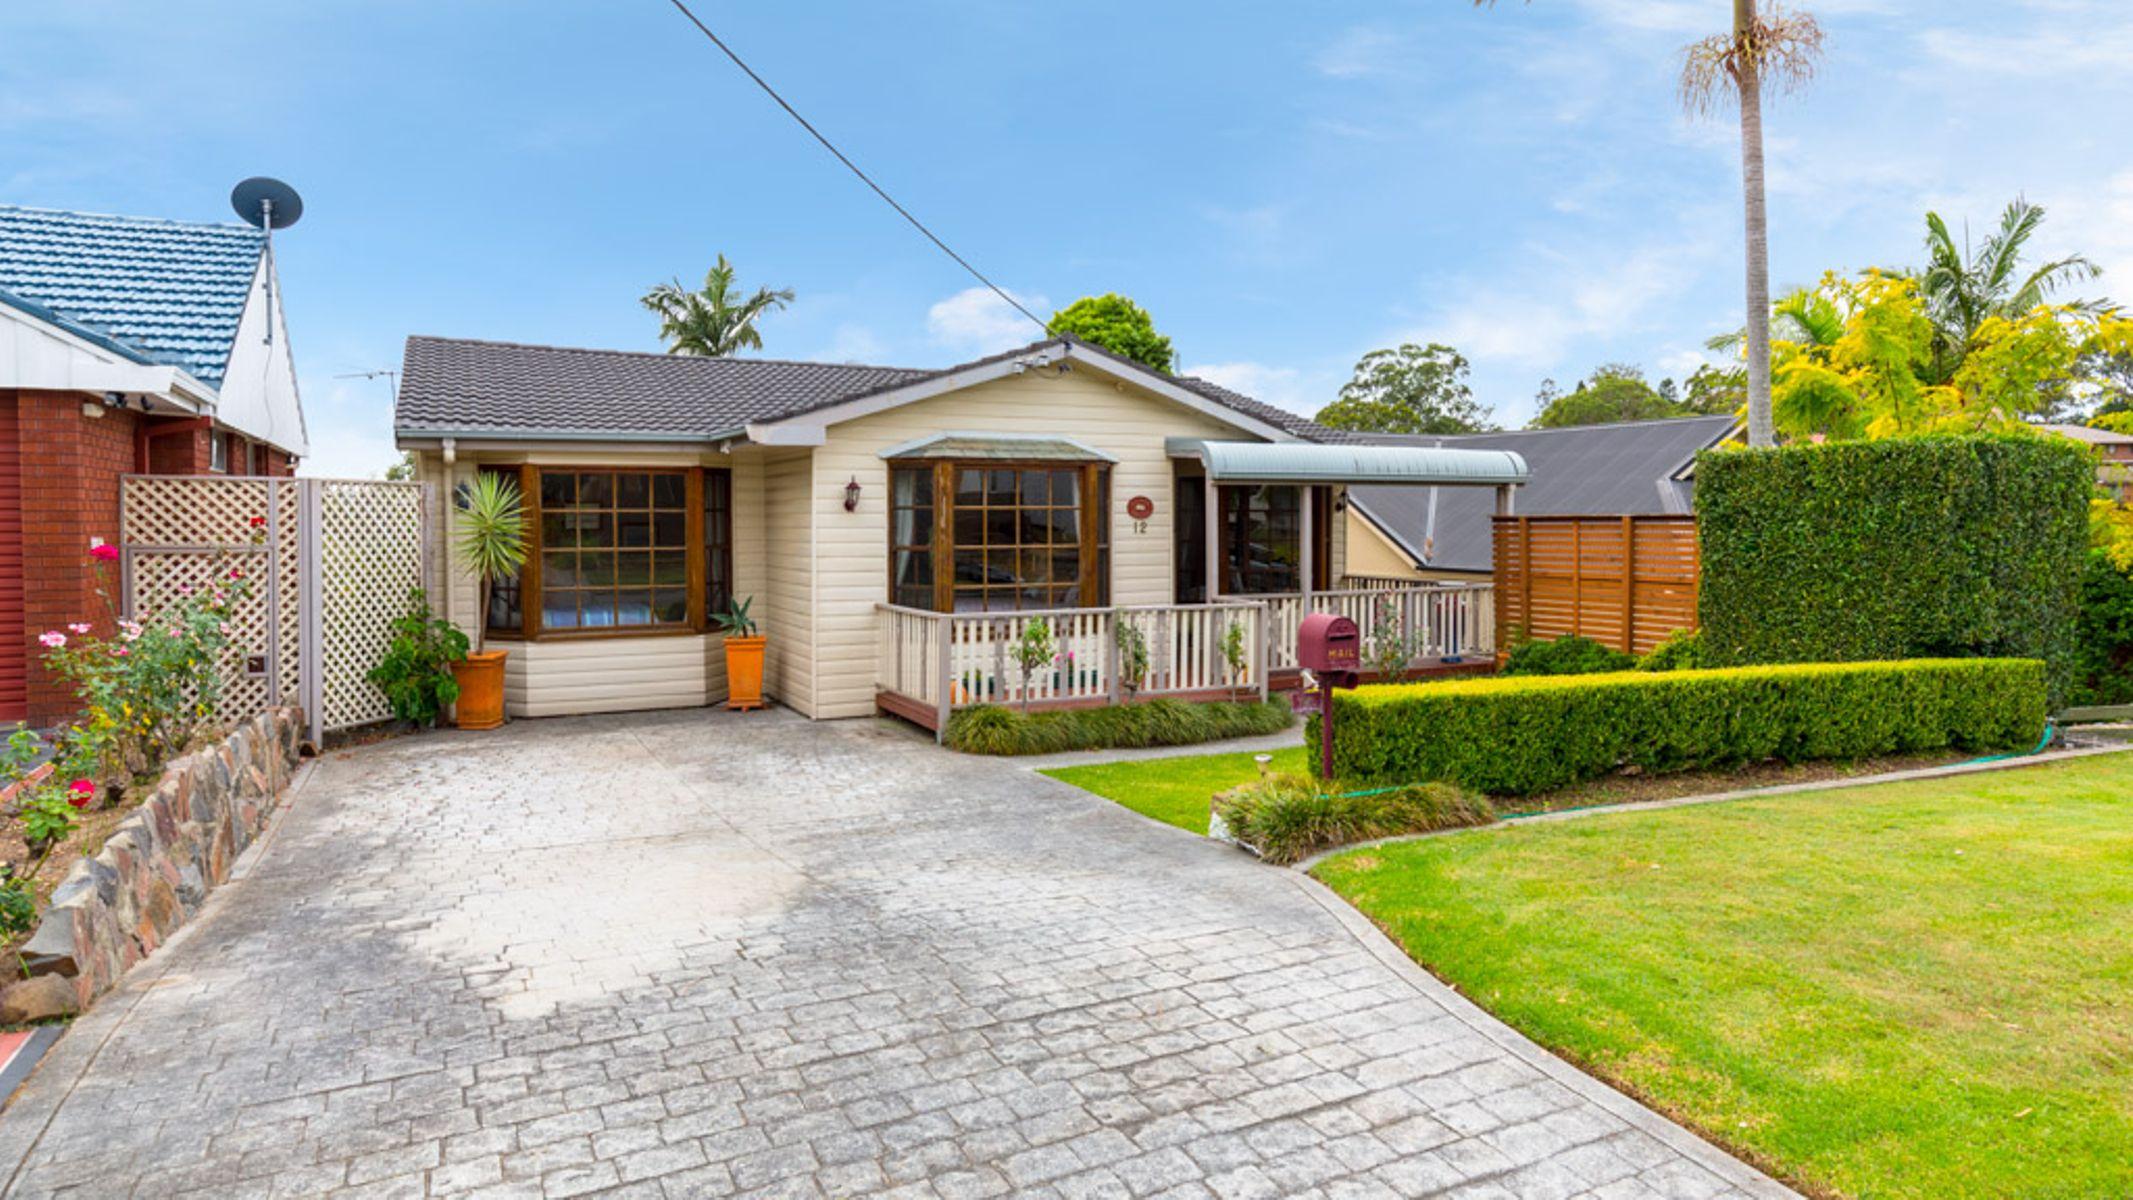 12 Morris St, Eleebana NSW 2282, Australia, House for Sale